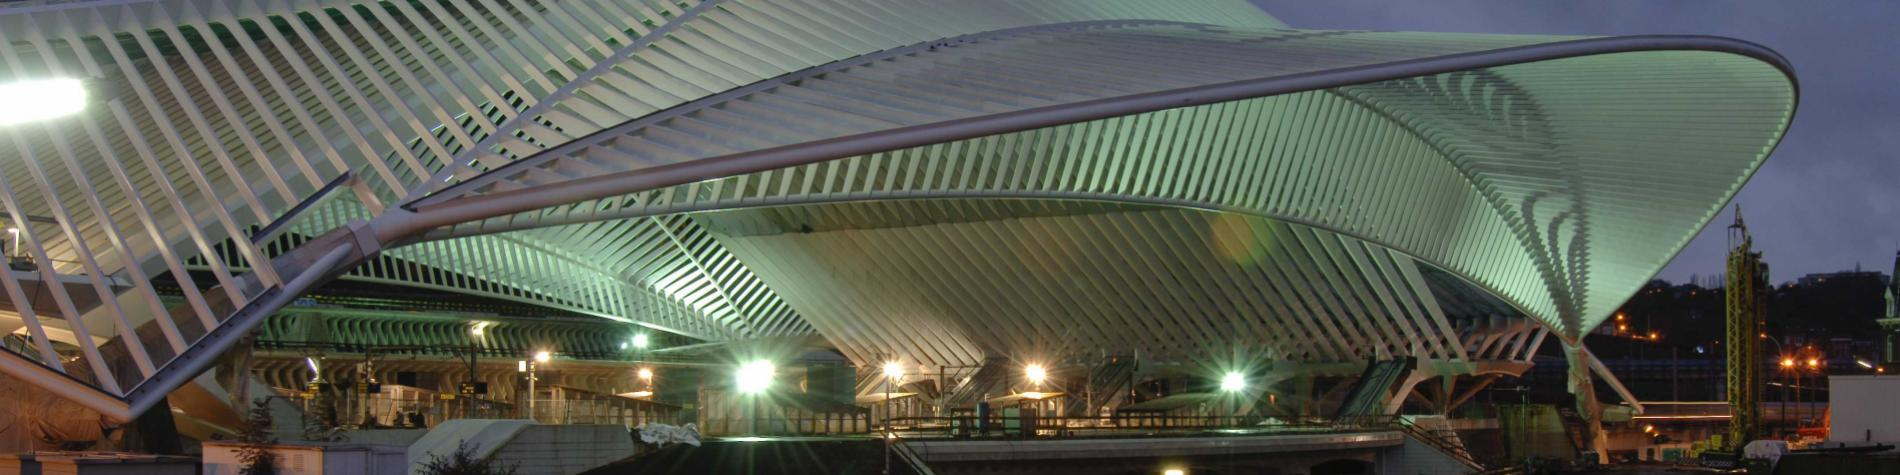 Gare - Liège-Guillemins - Santiago Calatrava